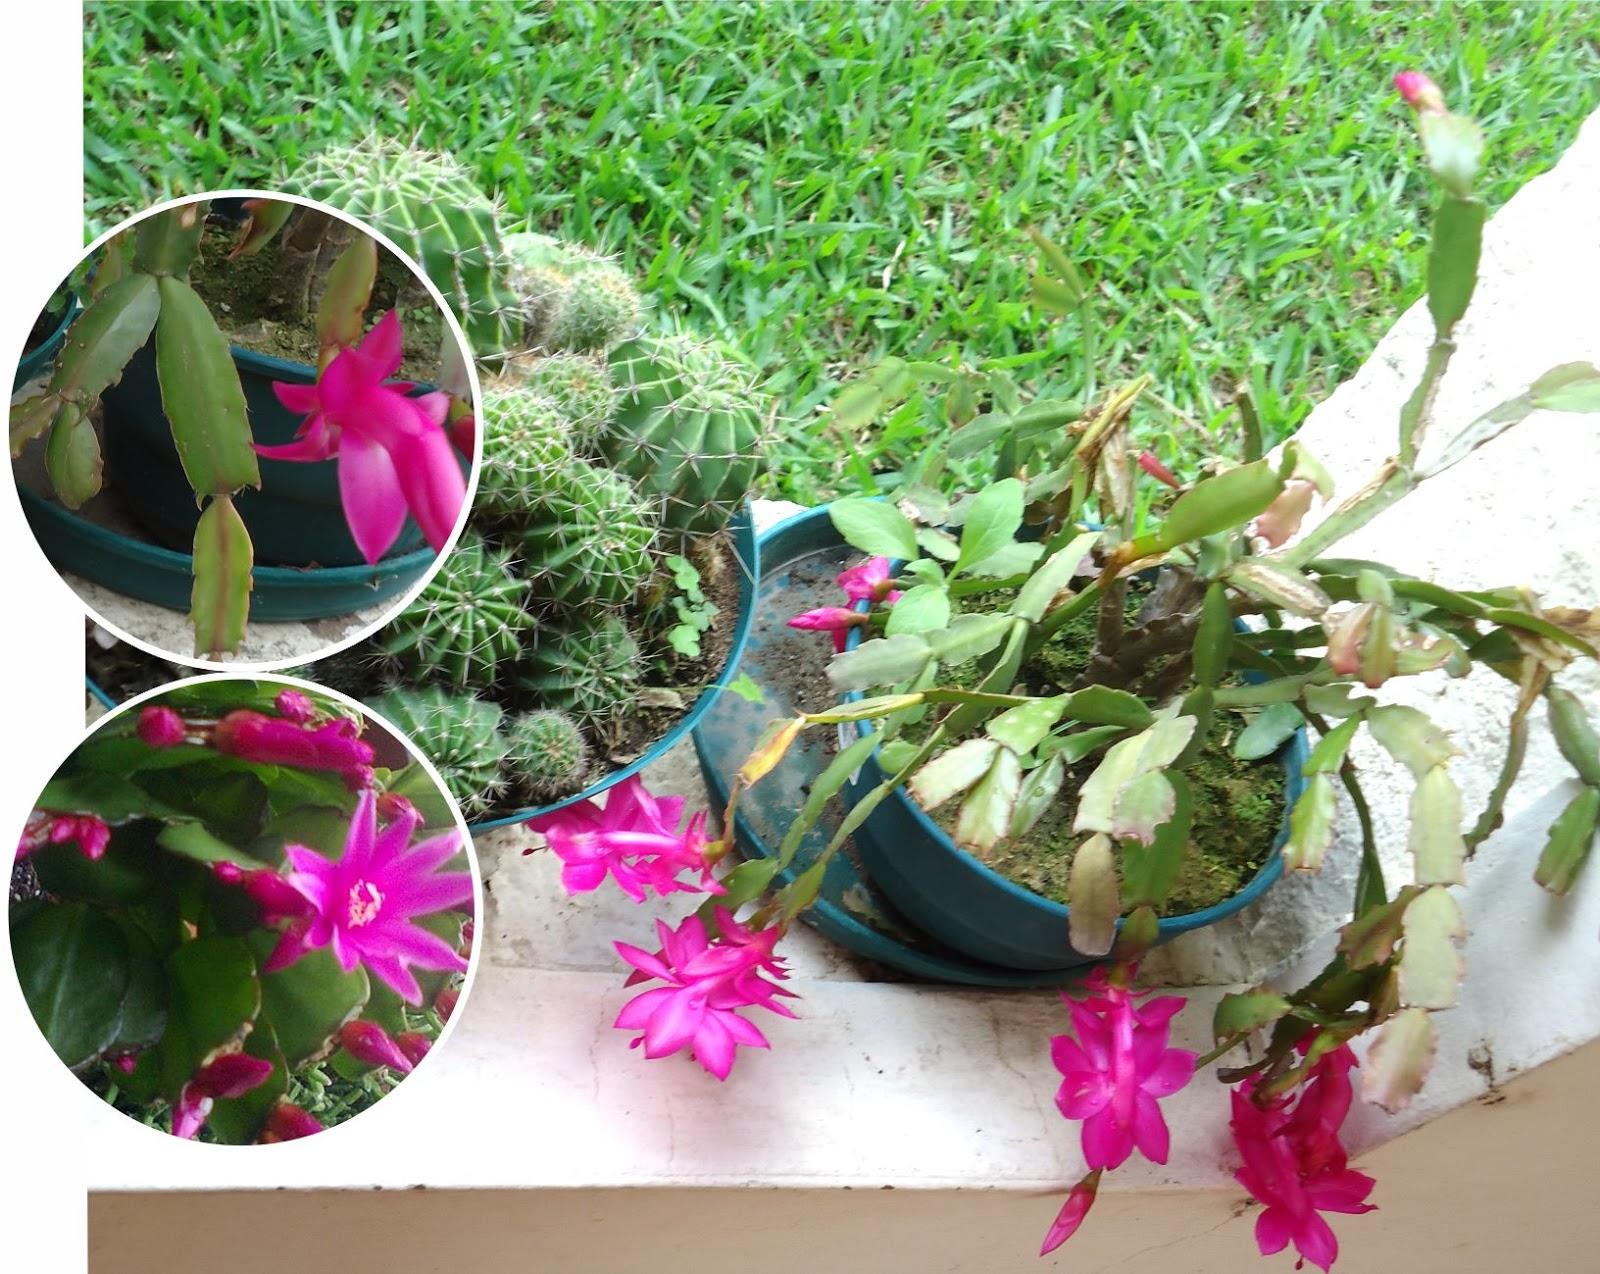 Tutuna mituna flor de mayo santa teresita for Santa teresita planta